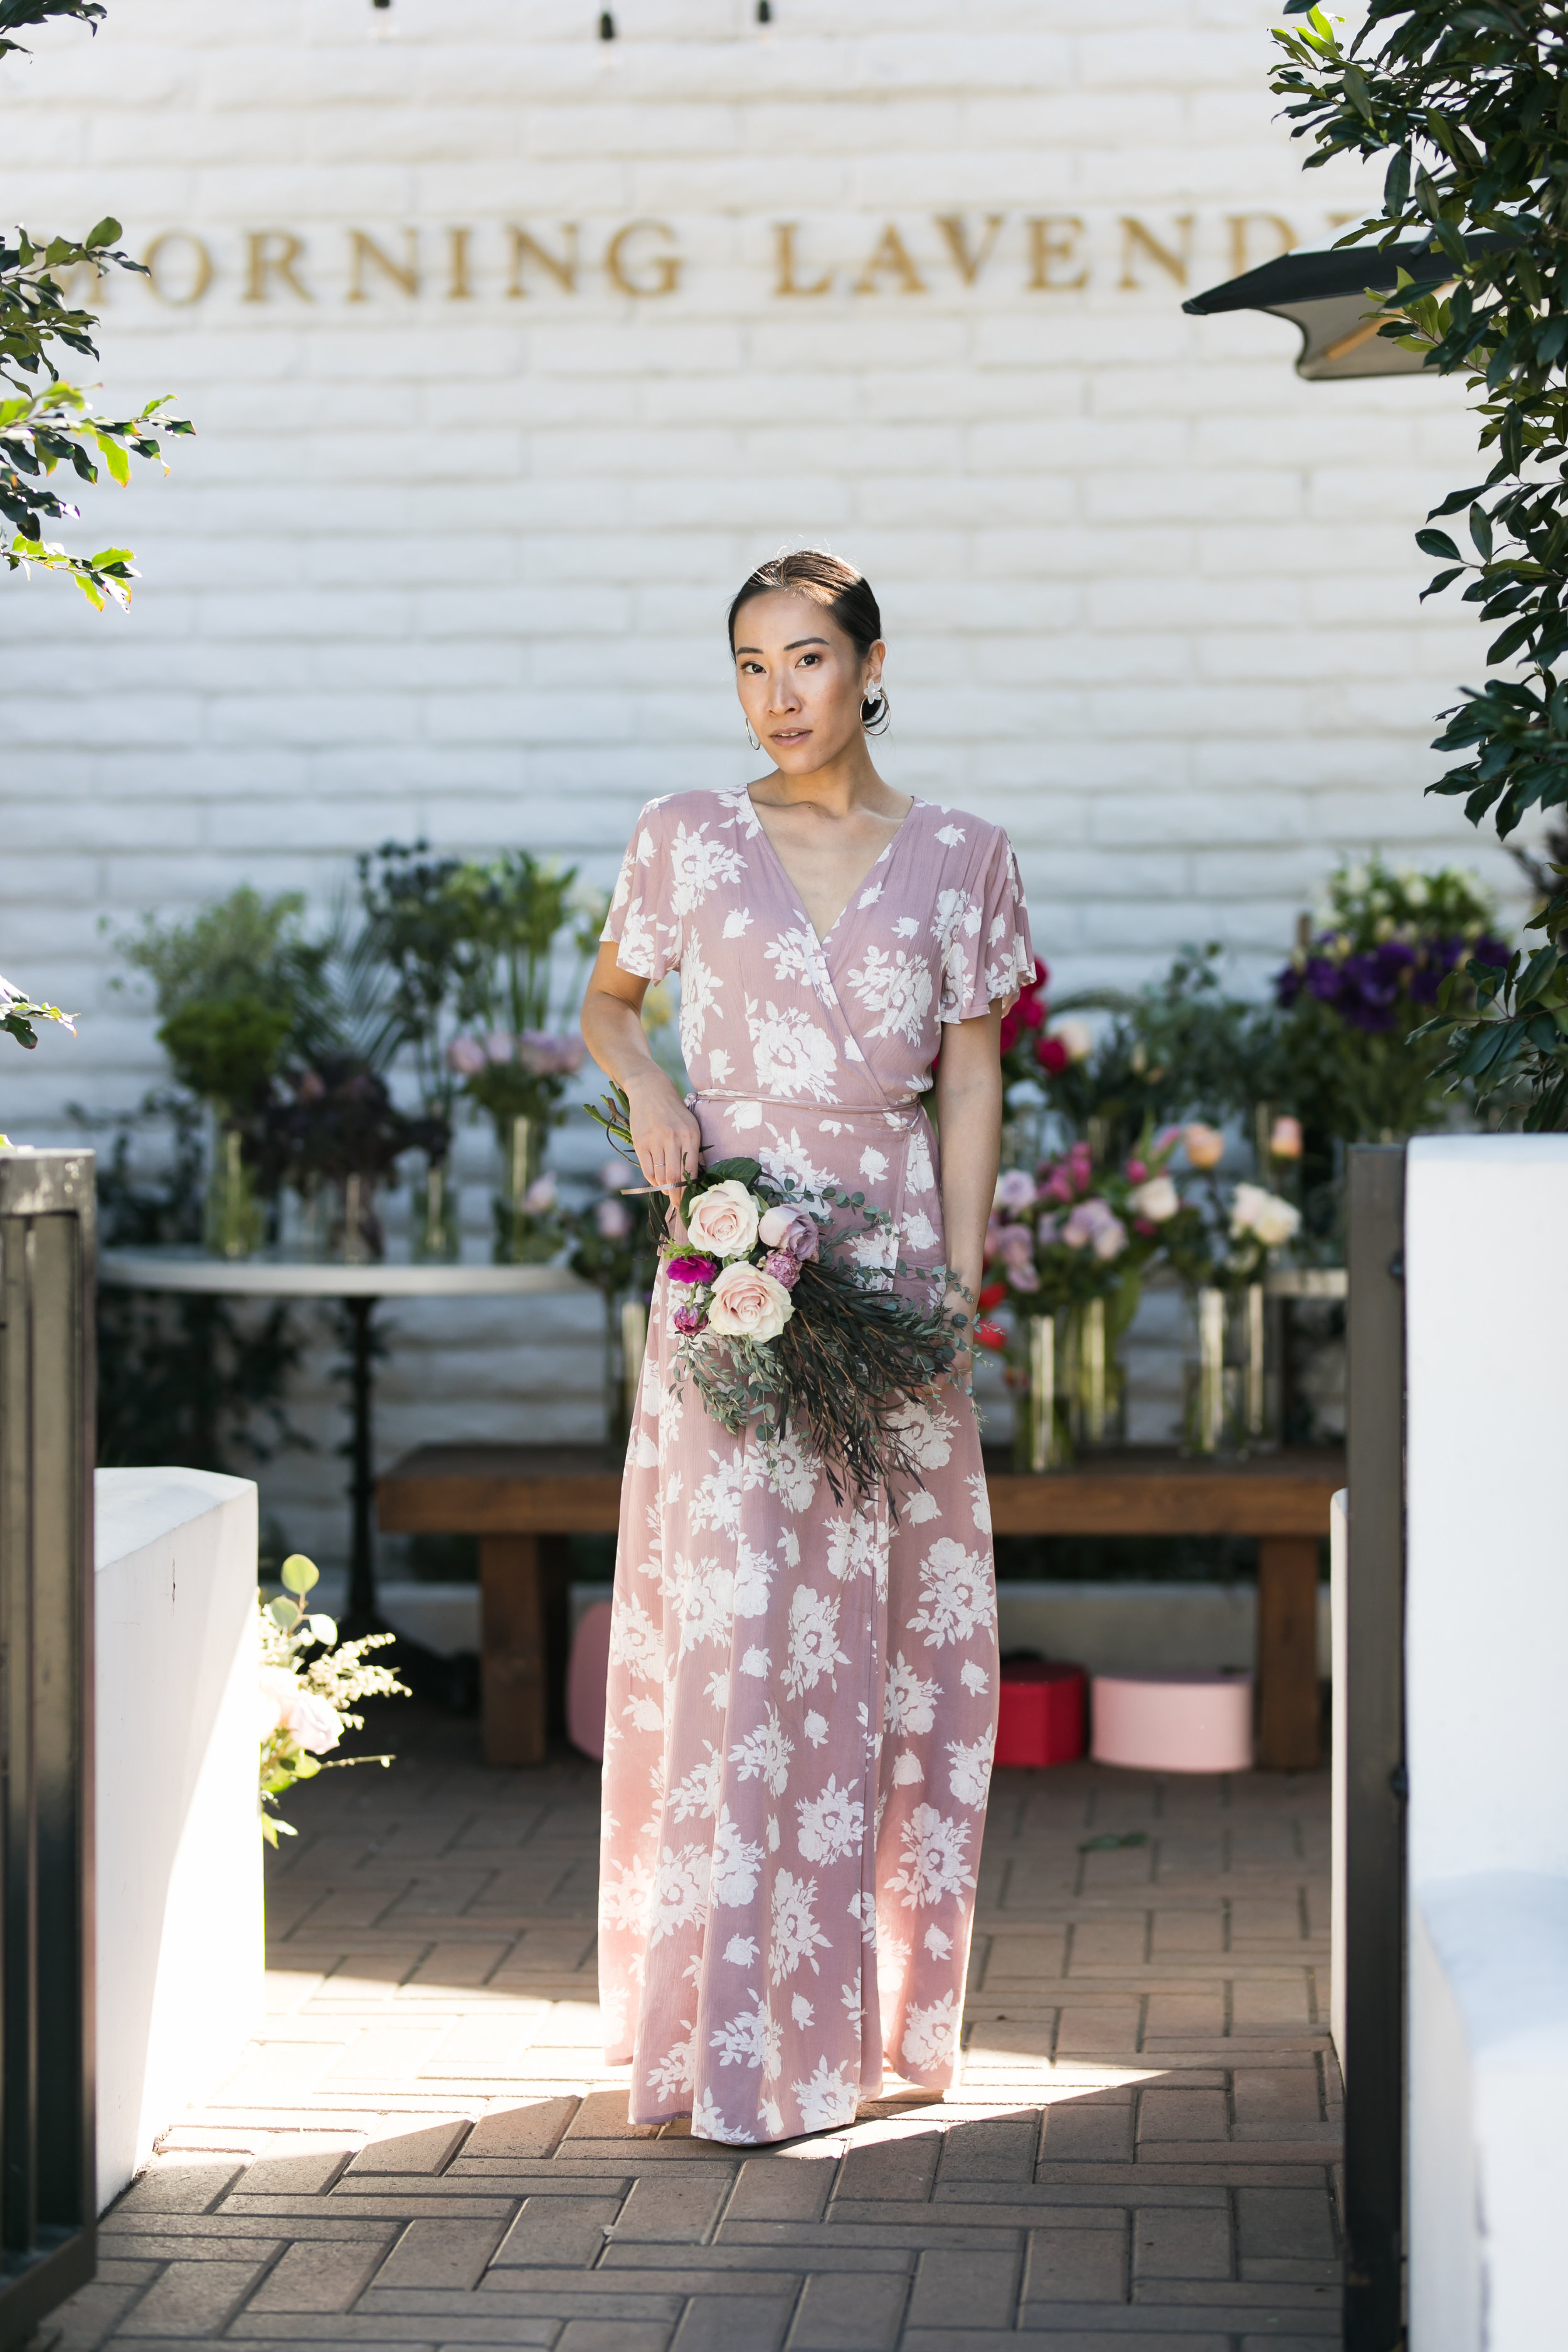 Morning Lavender Galentines 2019 - 066.jpg